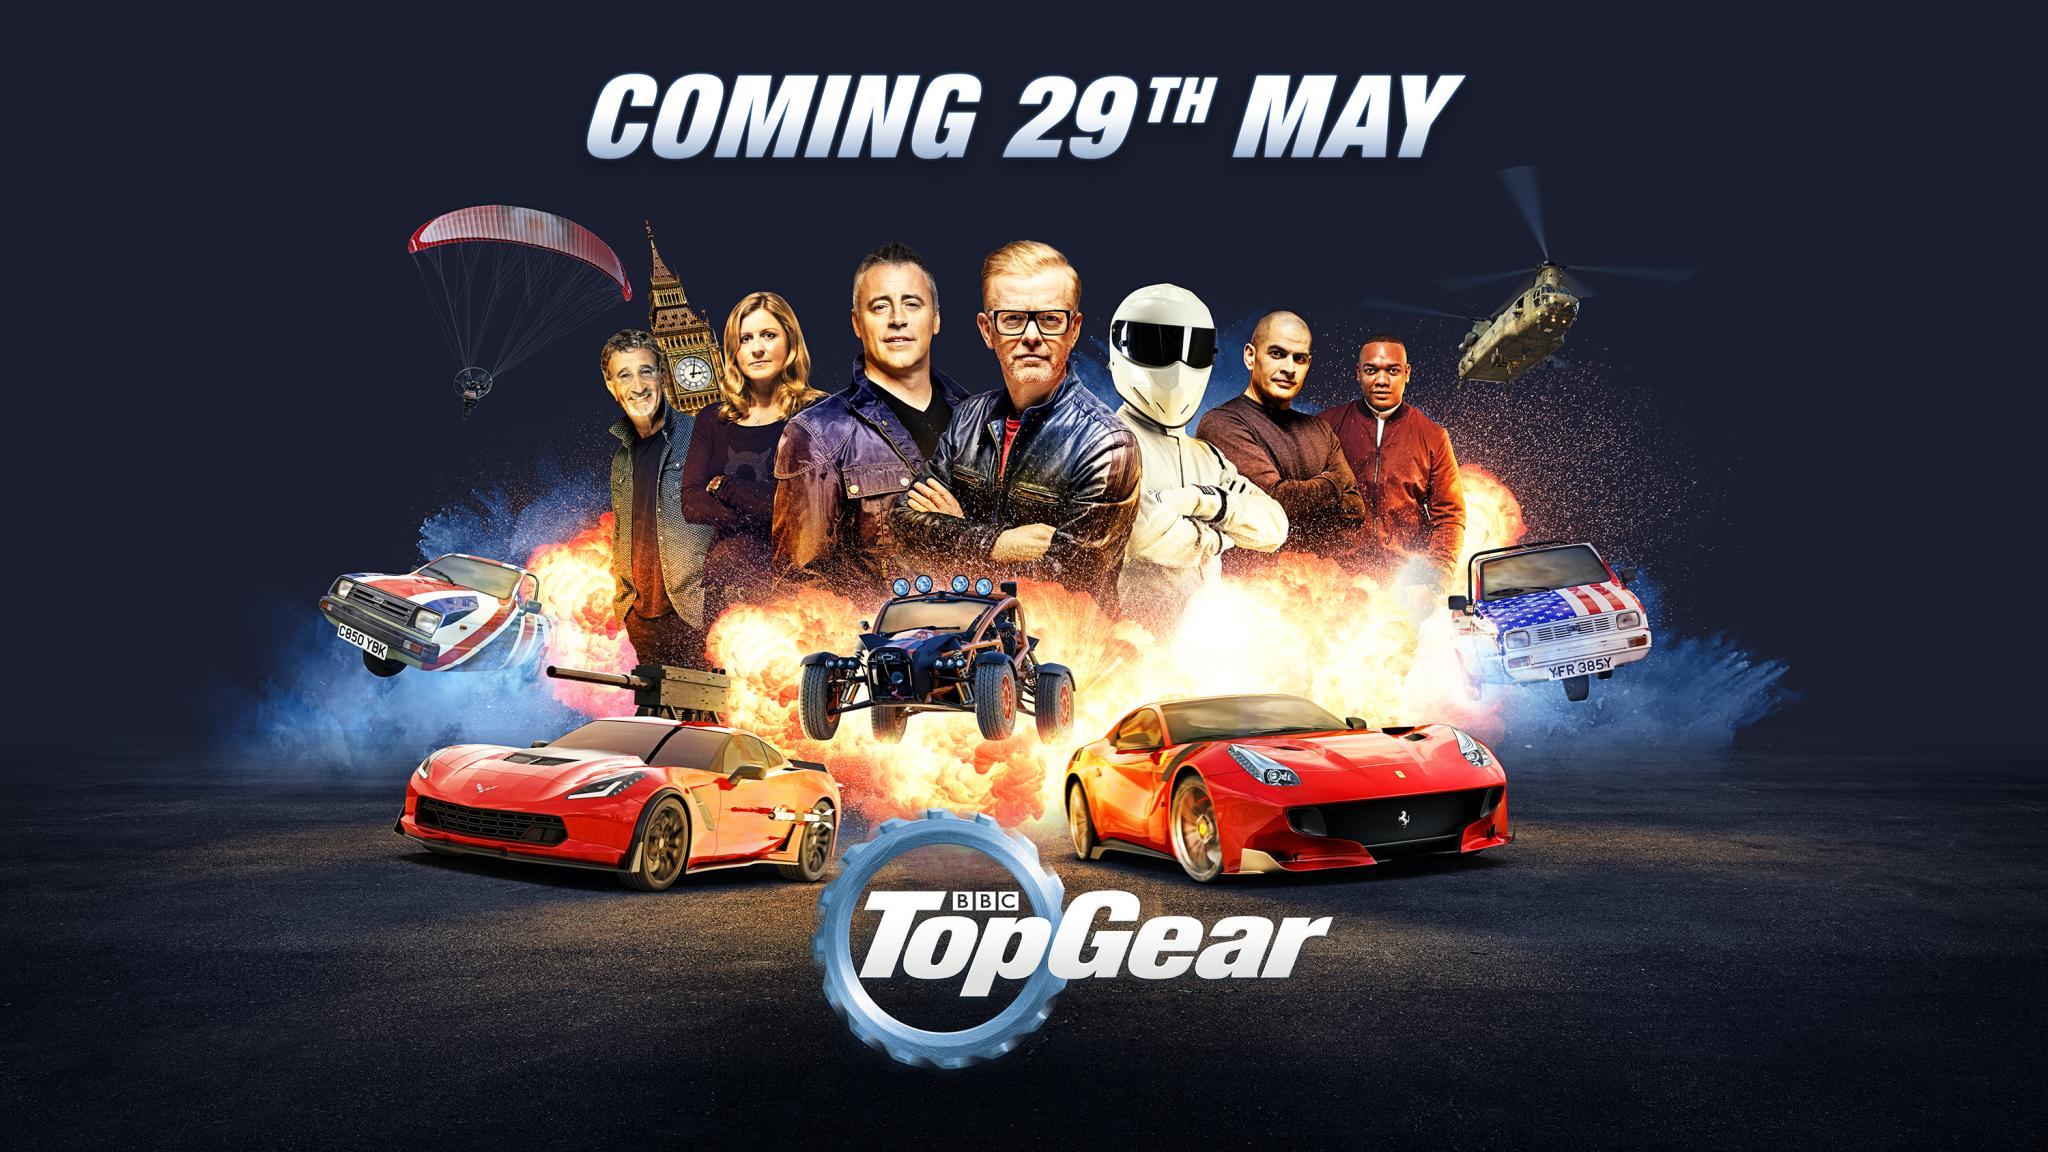 Top Gear art with Chris Evans, Matt LeBlanc, the Stig, Eddie Jordan, Sabine Schmitz, Chris Harris and Rory Reid stood behind an explosion of cars